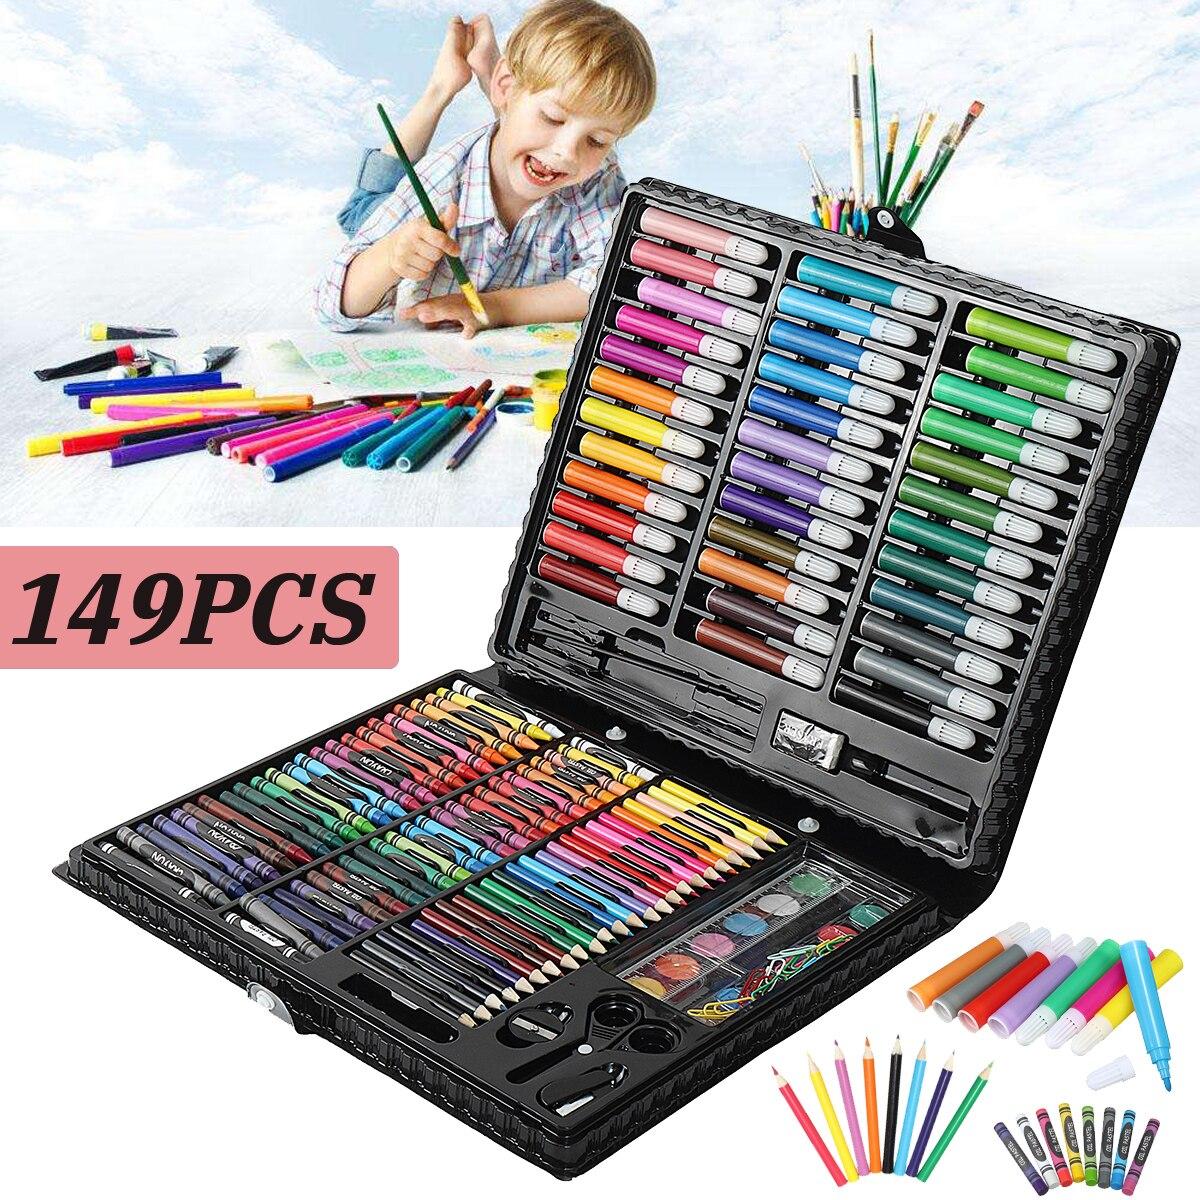 149pcs/set Complete Paint Drawing Art Kit Painting Supplies Wooden Box Set Storage Case 138 Piece Gift Pencil stanley complete painting